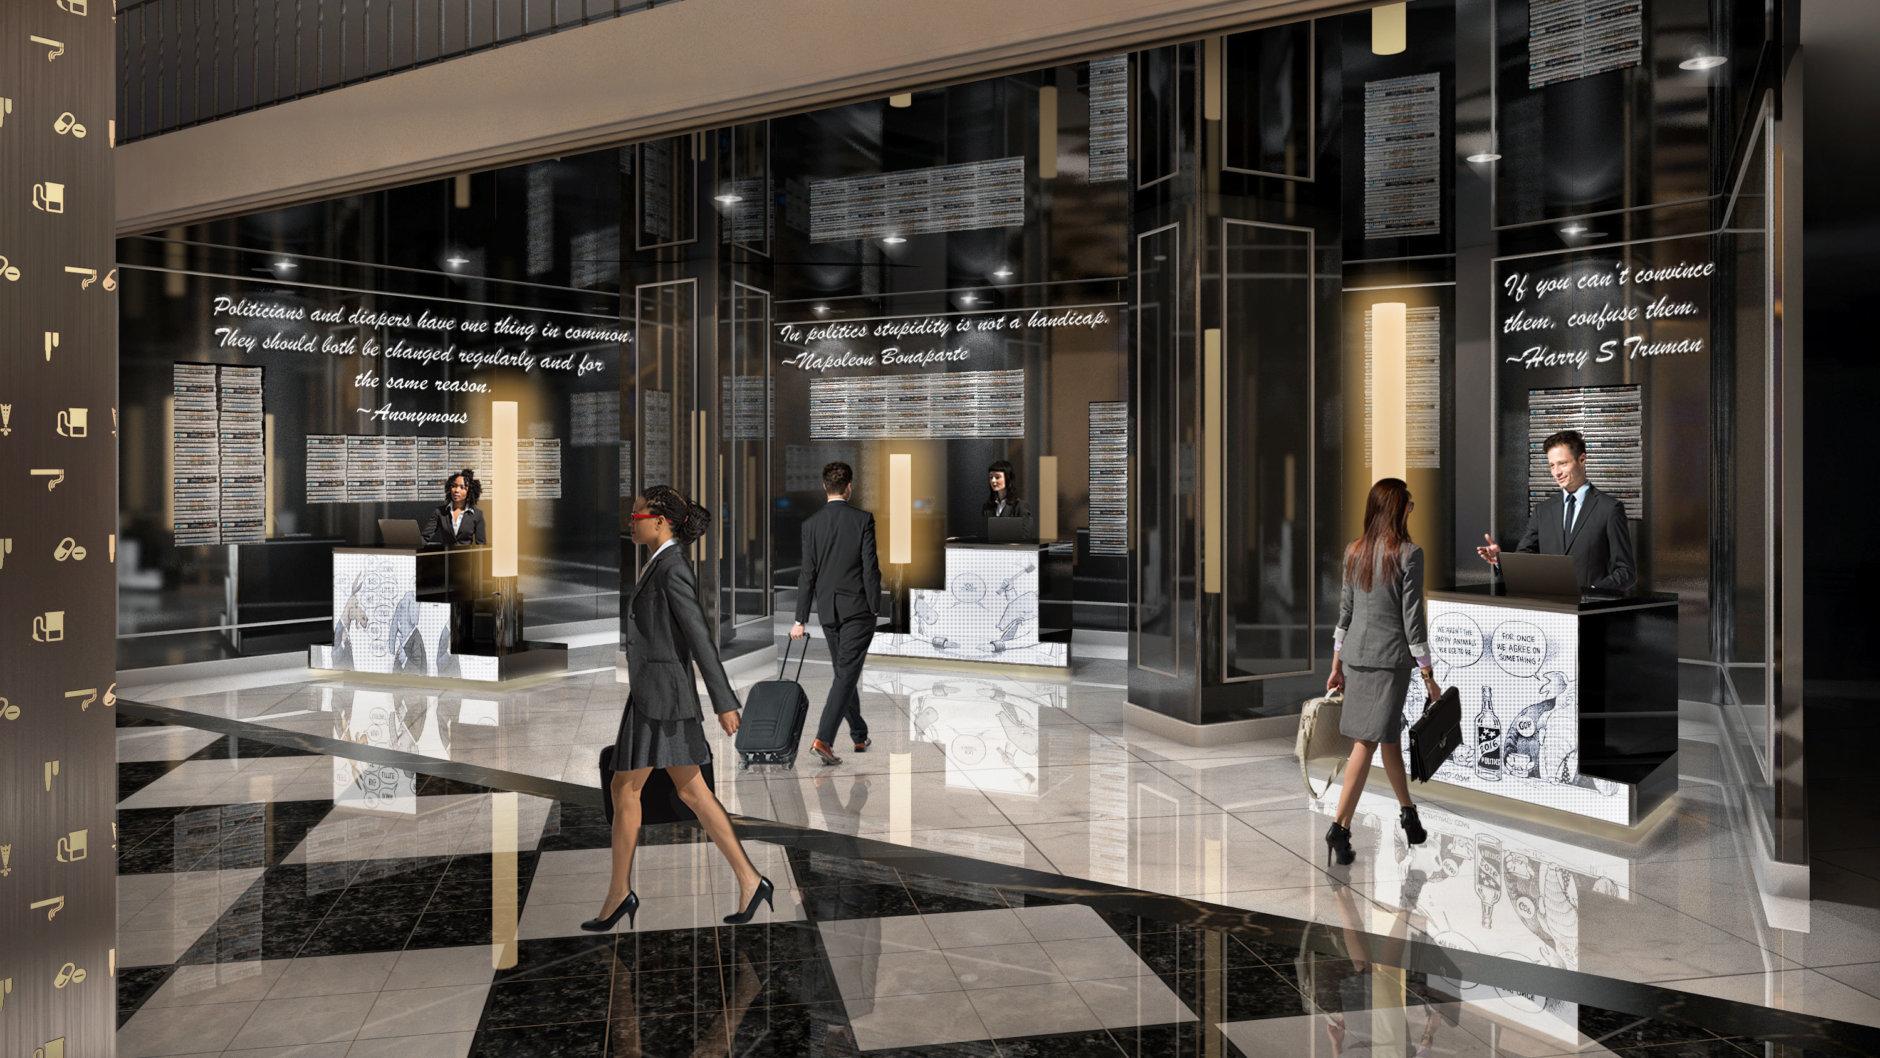 Marriott International will start a $50 million, top-to-bottom renovation of its W Washington DC, the former Hotel Washington it acquired in 2009. (Credit: Marriott International)